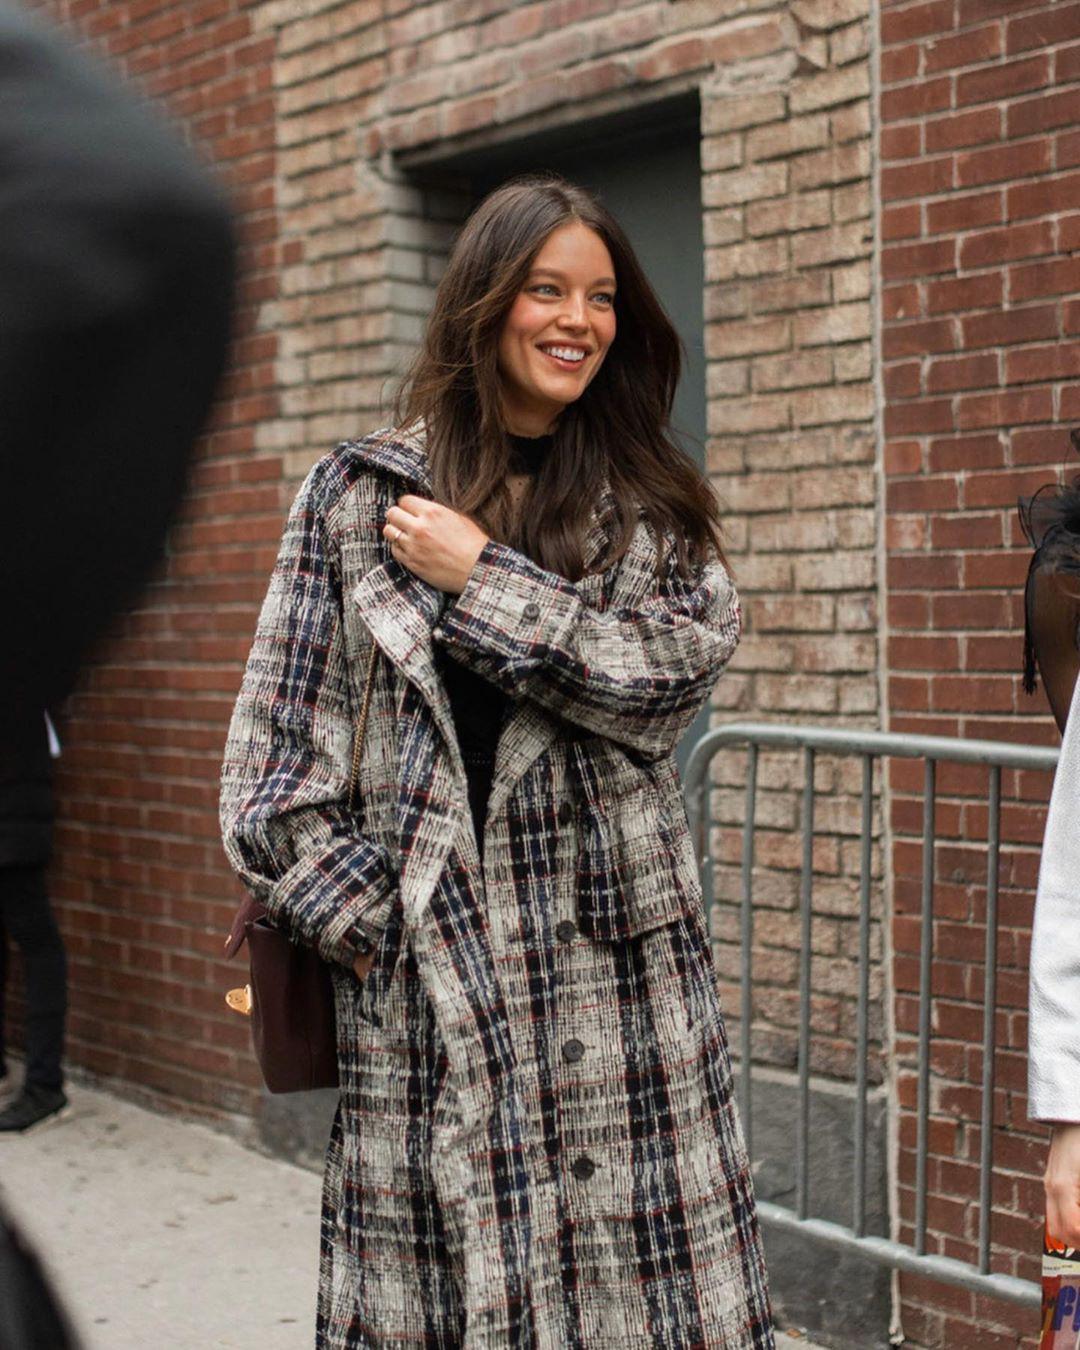 Emily DiDonato tartan, fur dress for girls, outfit designs